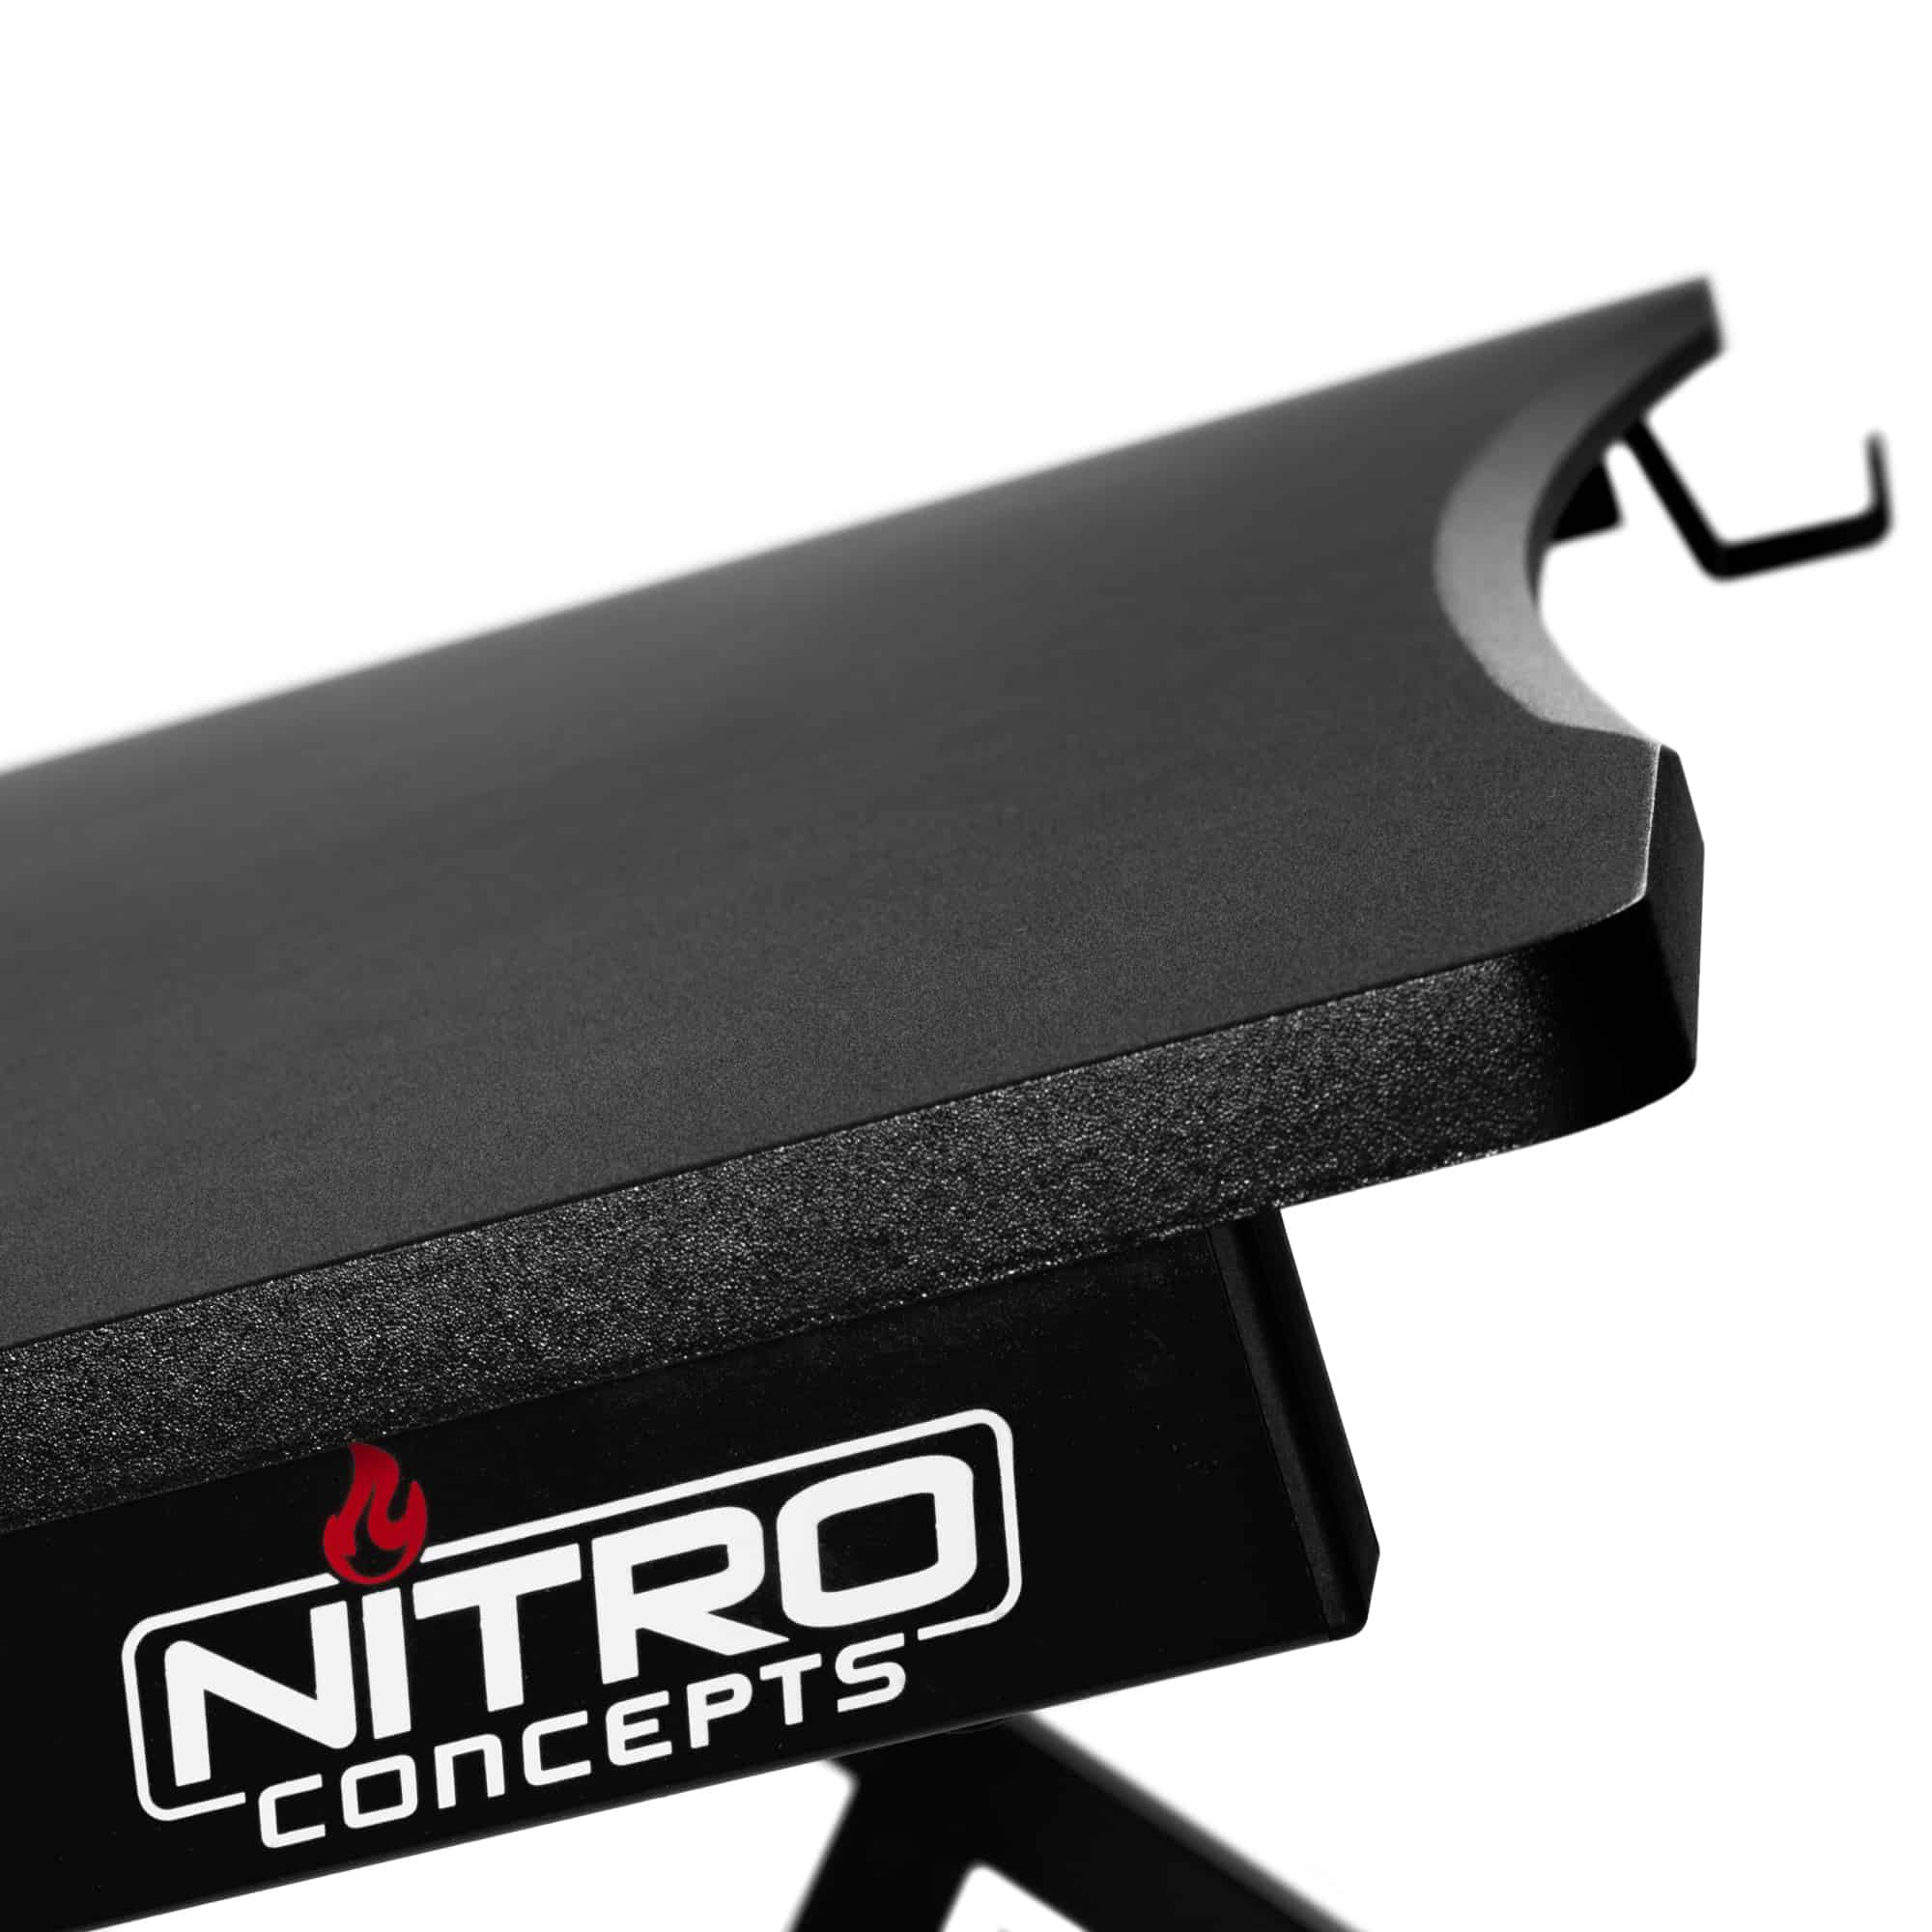 Gamer asztal Nitro Concepts D12 1160 x 750 mm Fekete